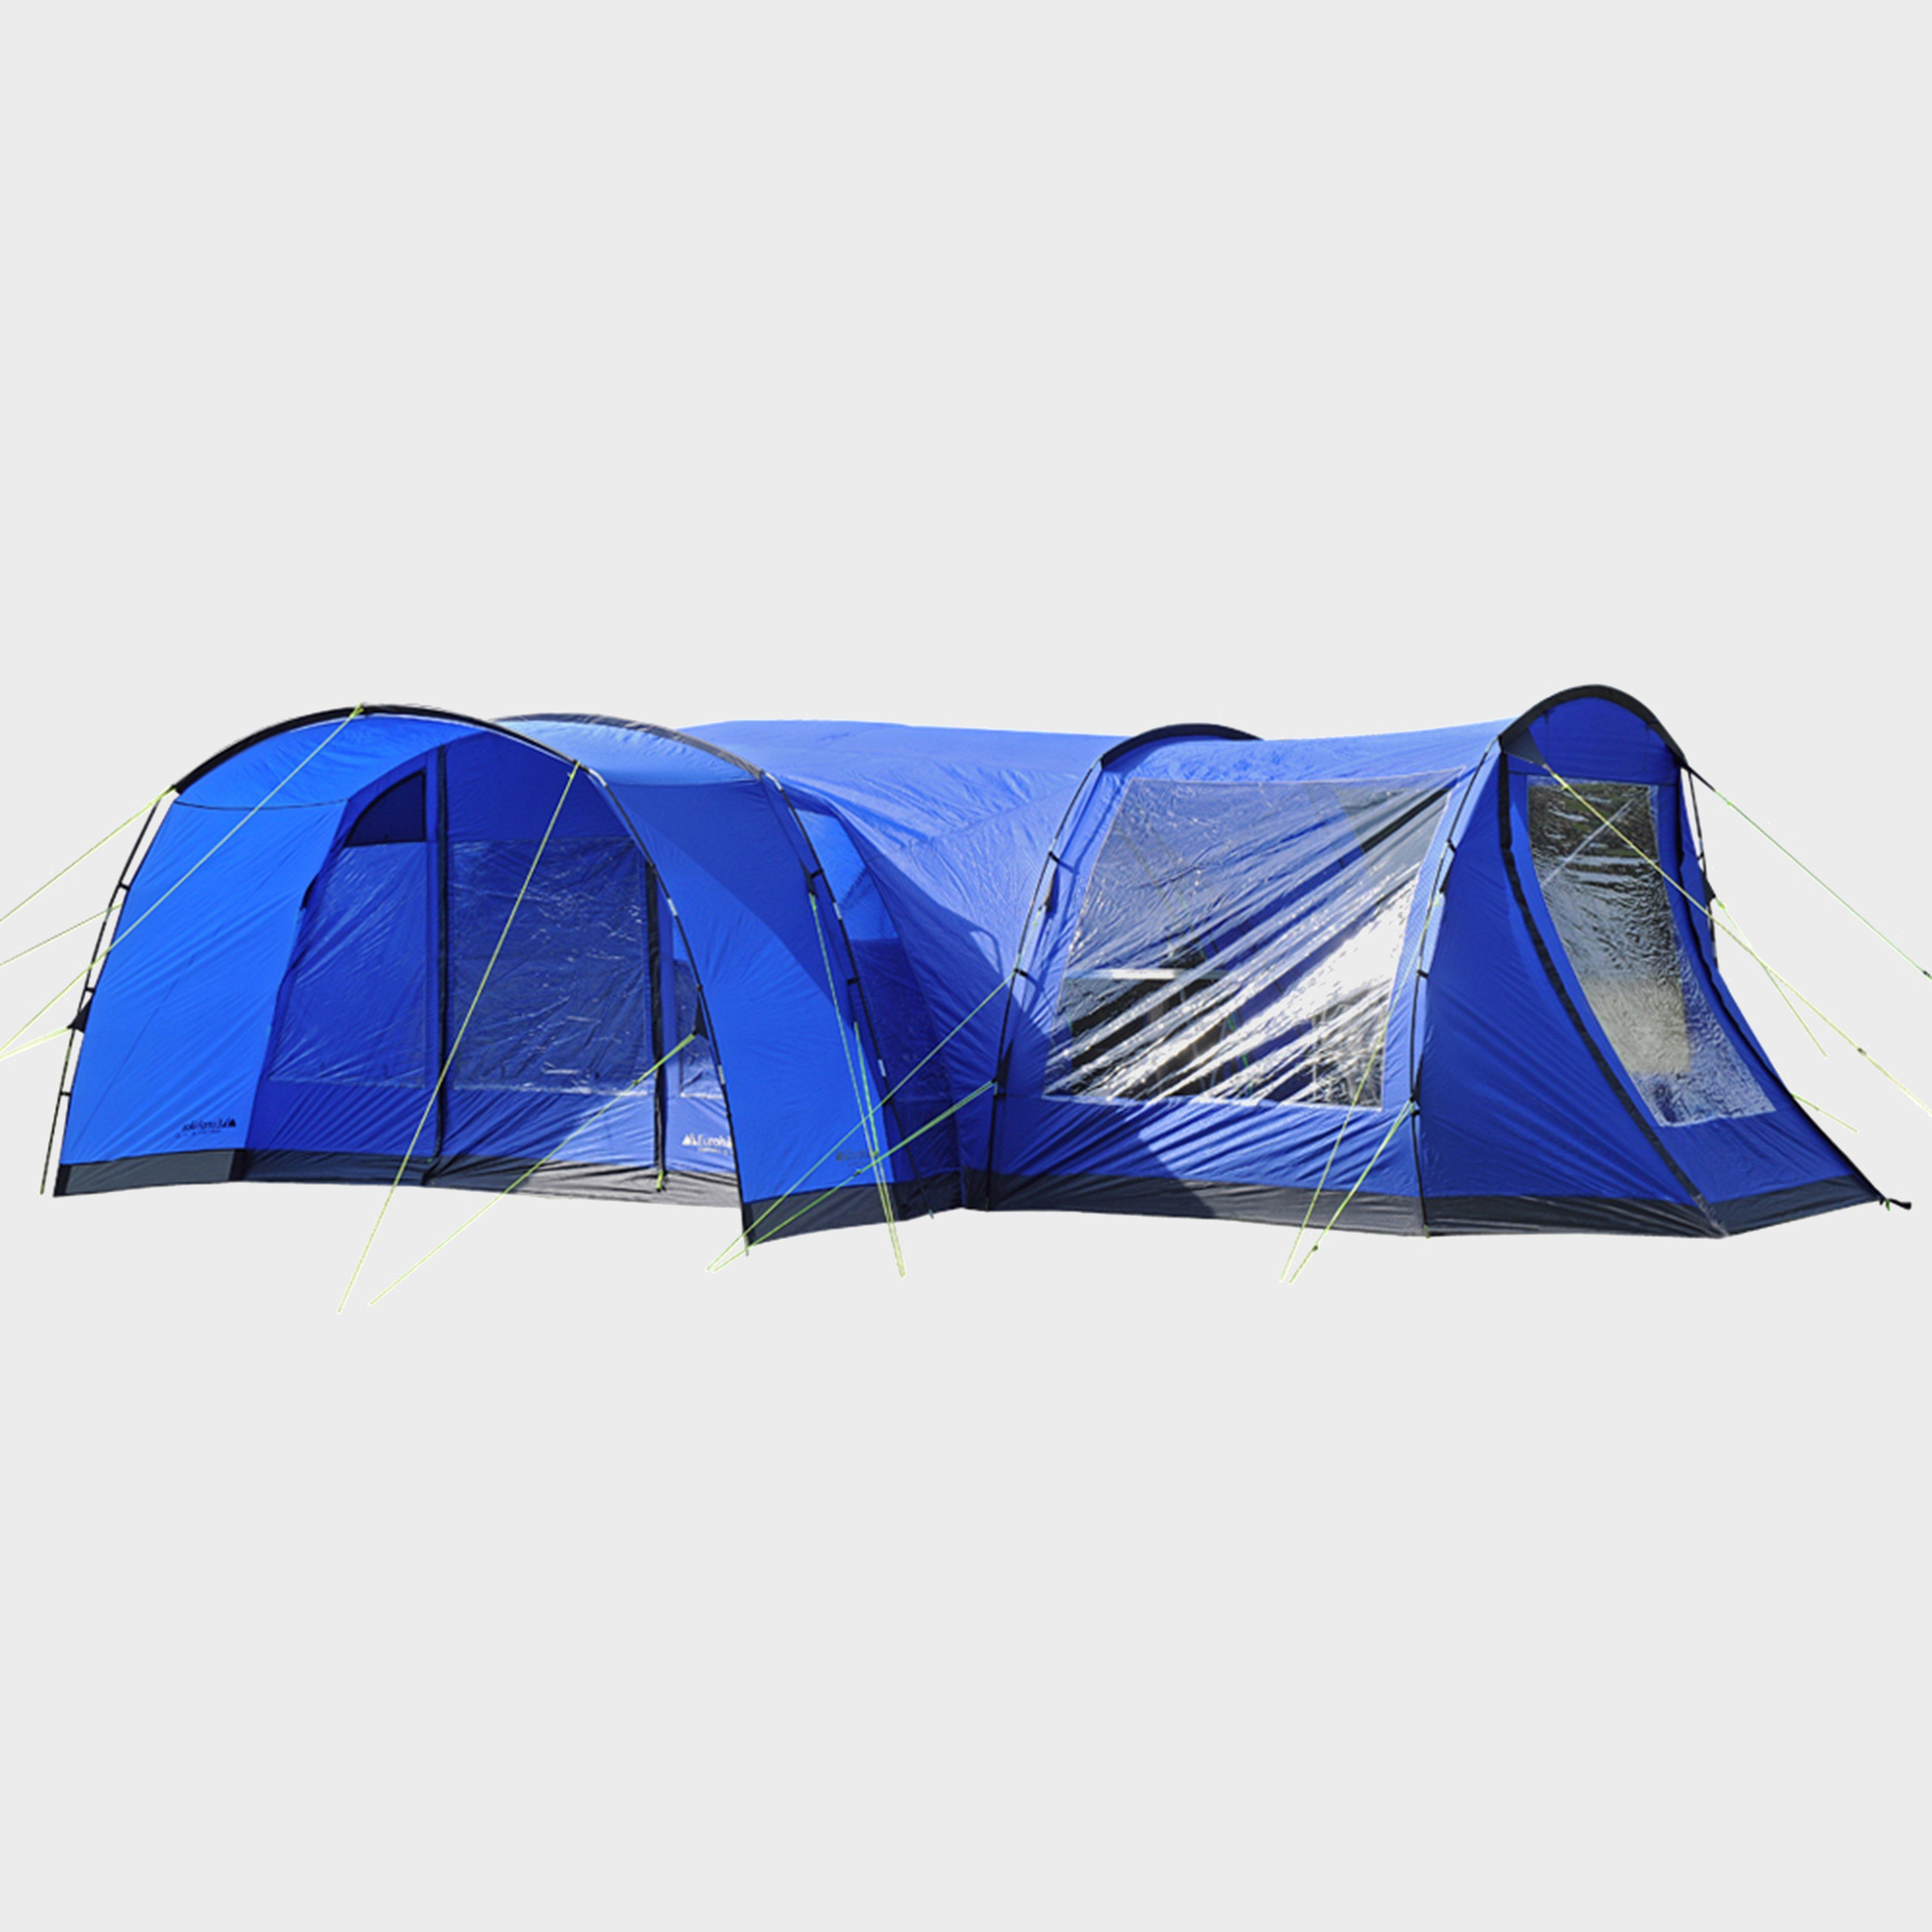 Eurohike Side Porch XL - Blue, Blue